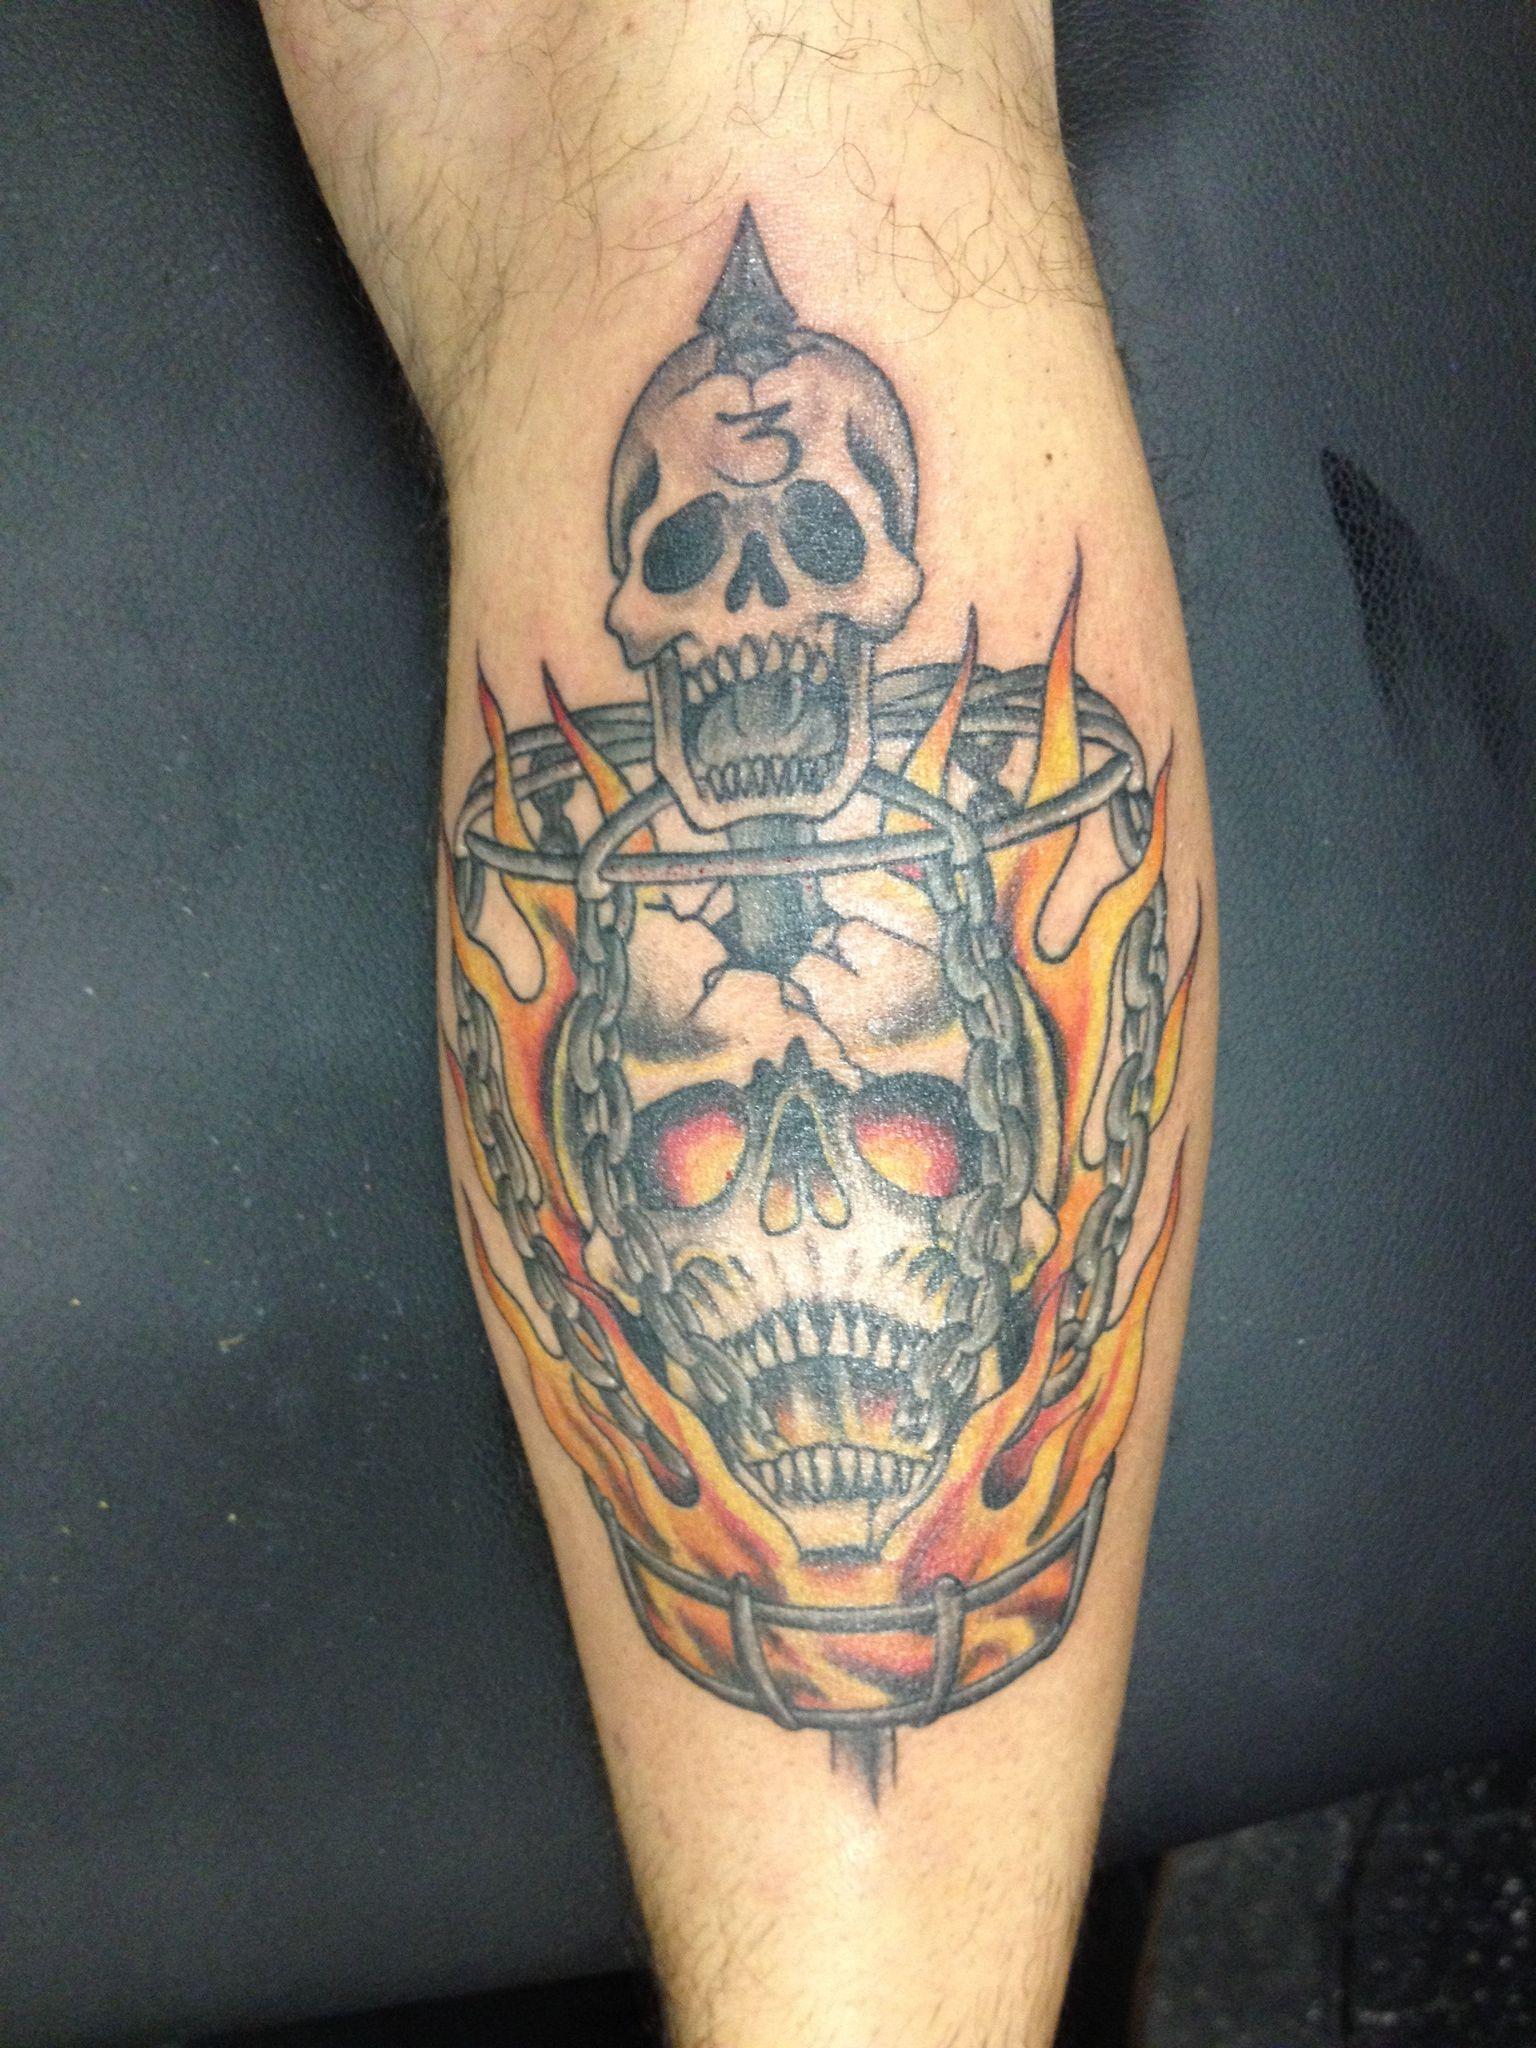 Tattoo Shops Bryan Tx : tattoo, shops, bryan, HobbyTown, Texas, Hobby, North, Basket,, Tattoo,